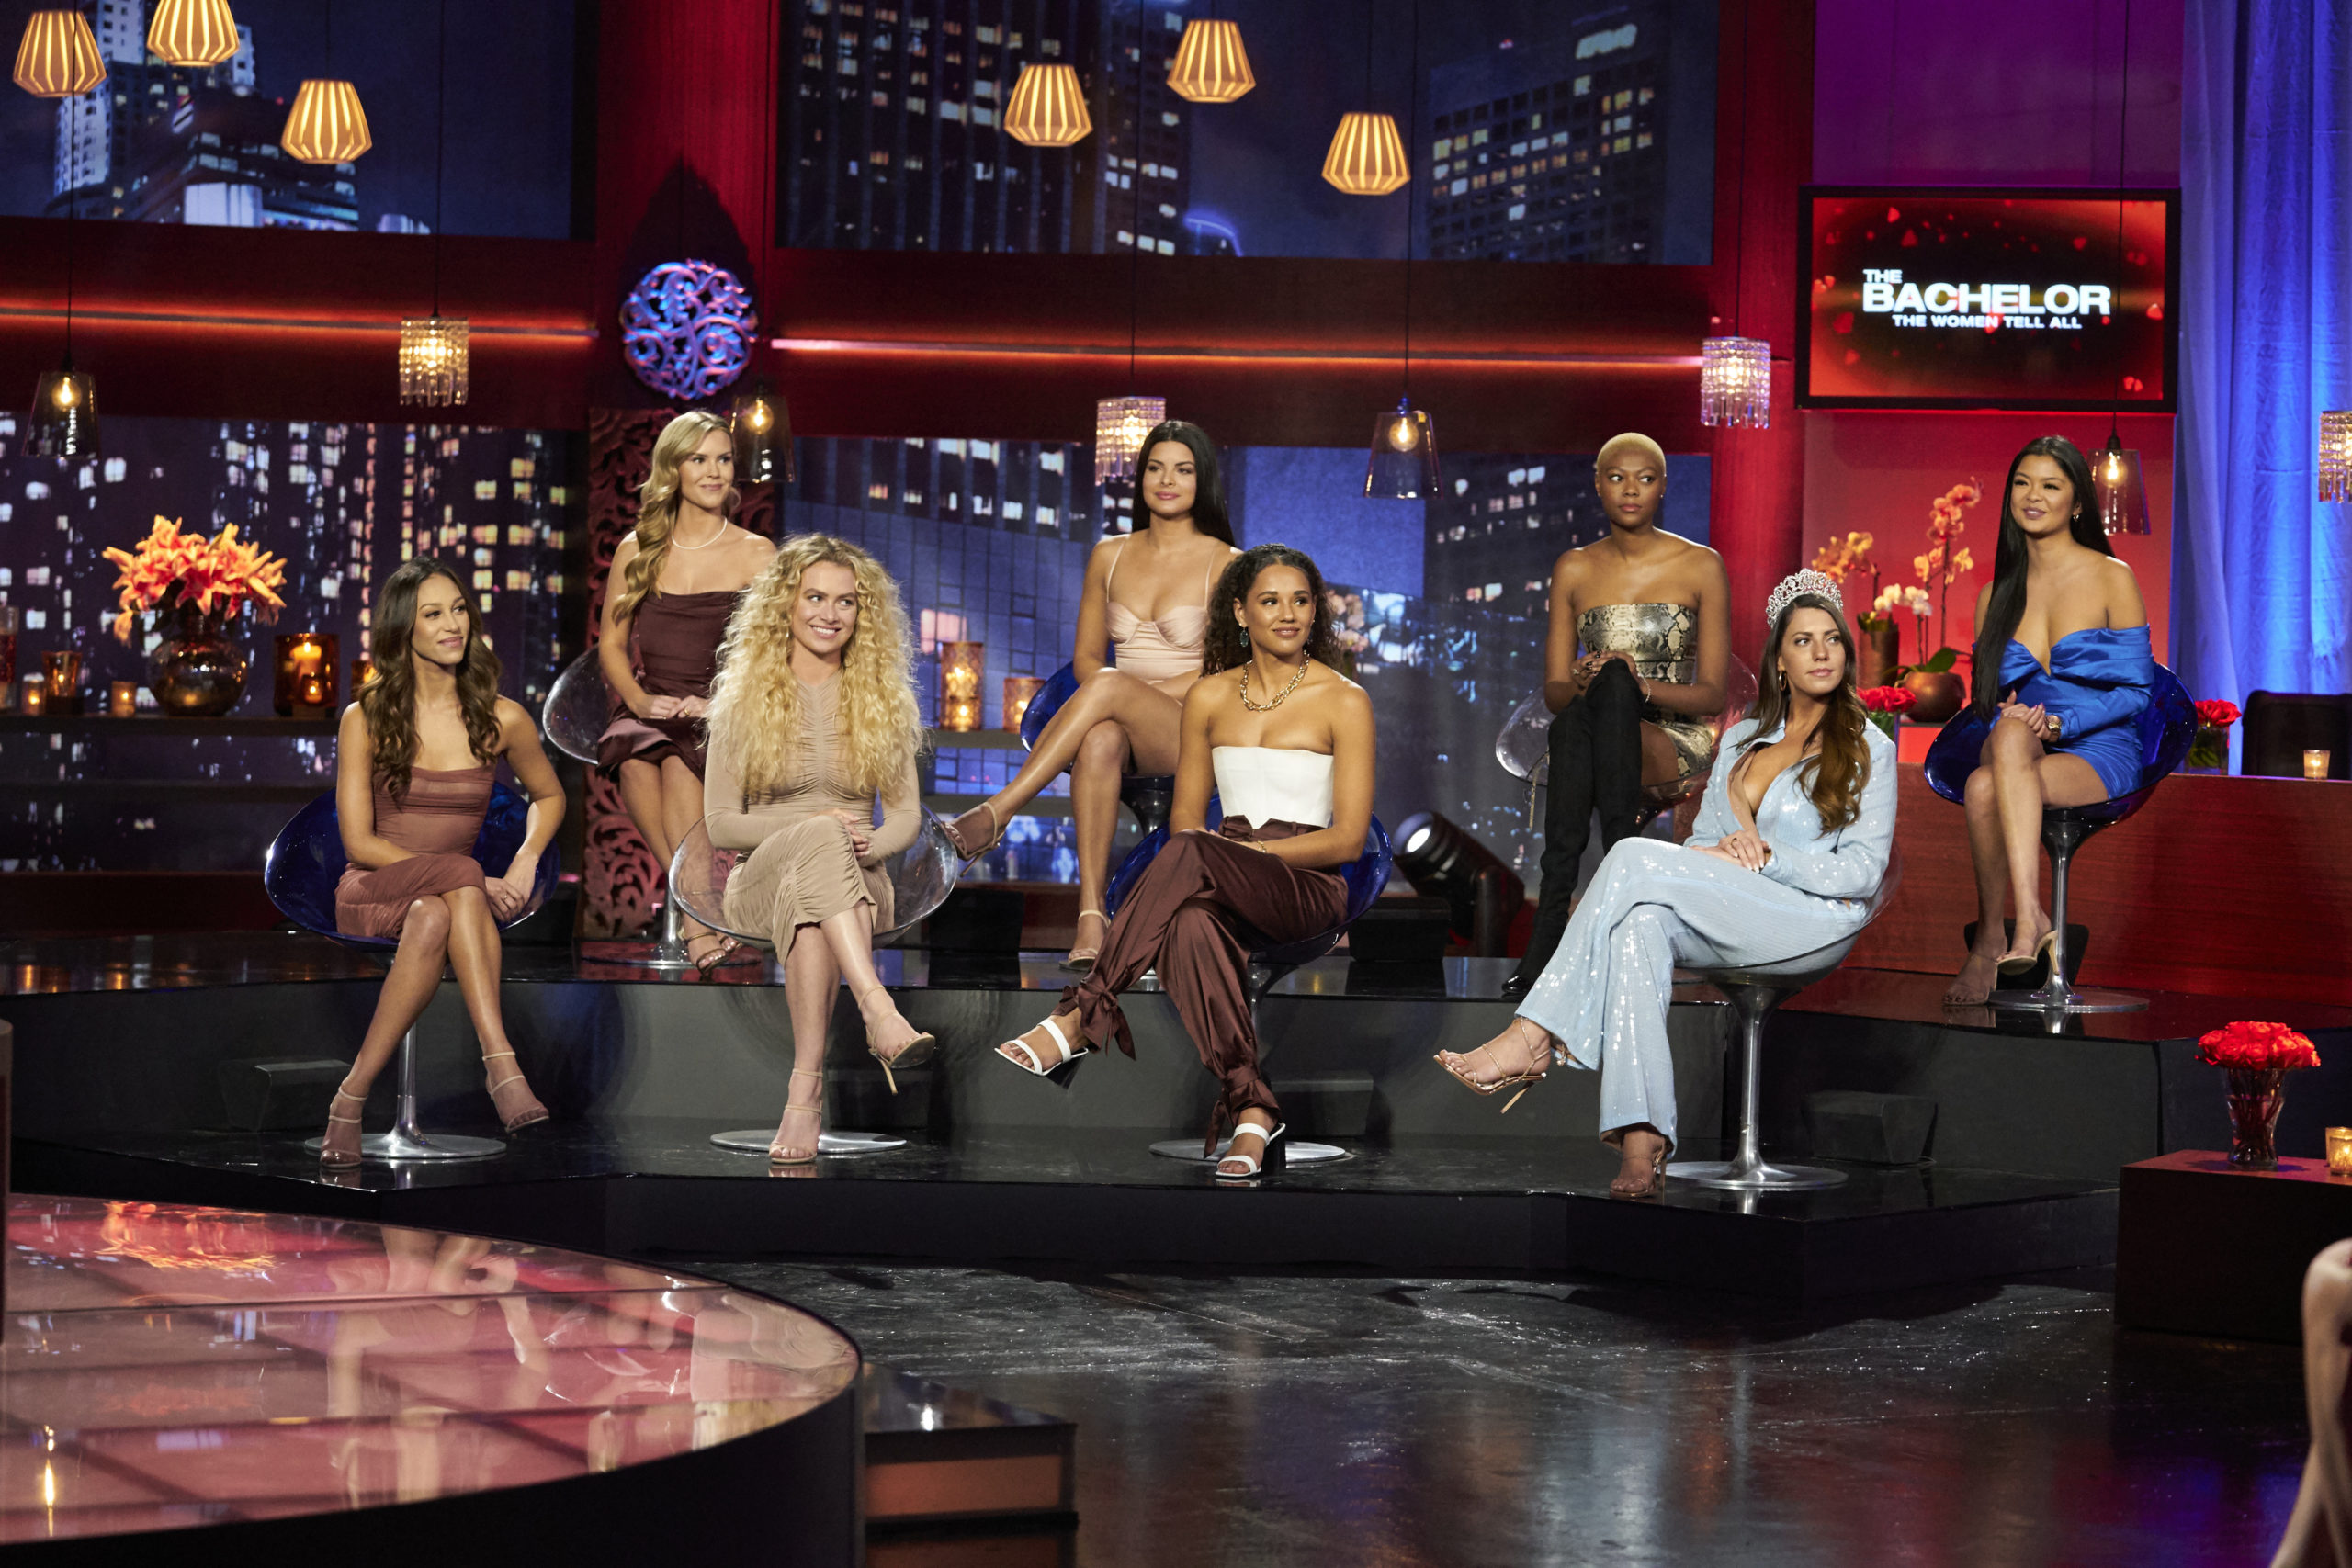 The Bachelor Recap for 3/1/21: The Women Tell All